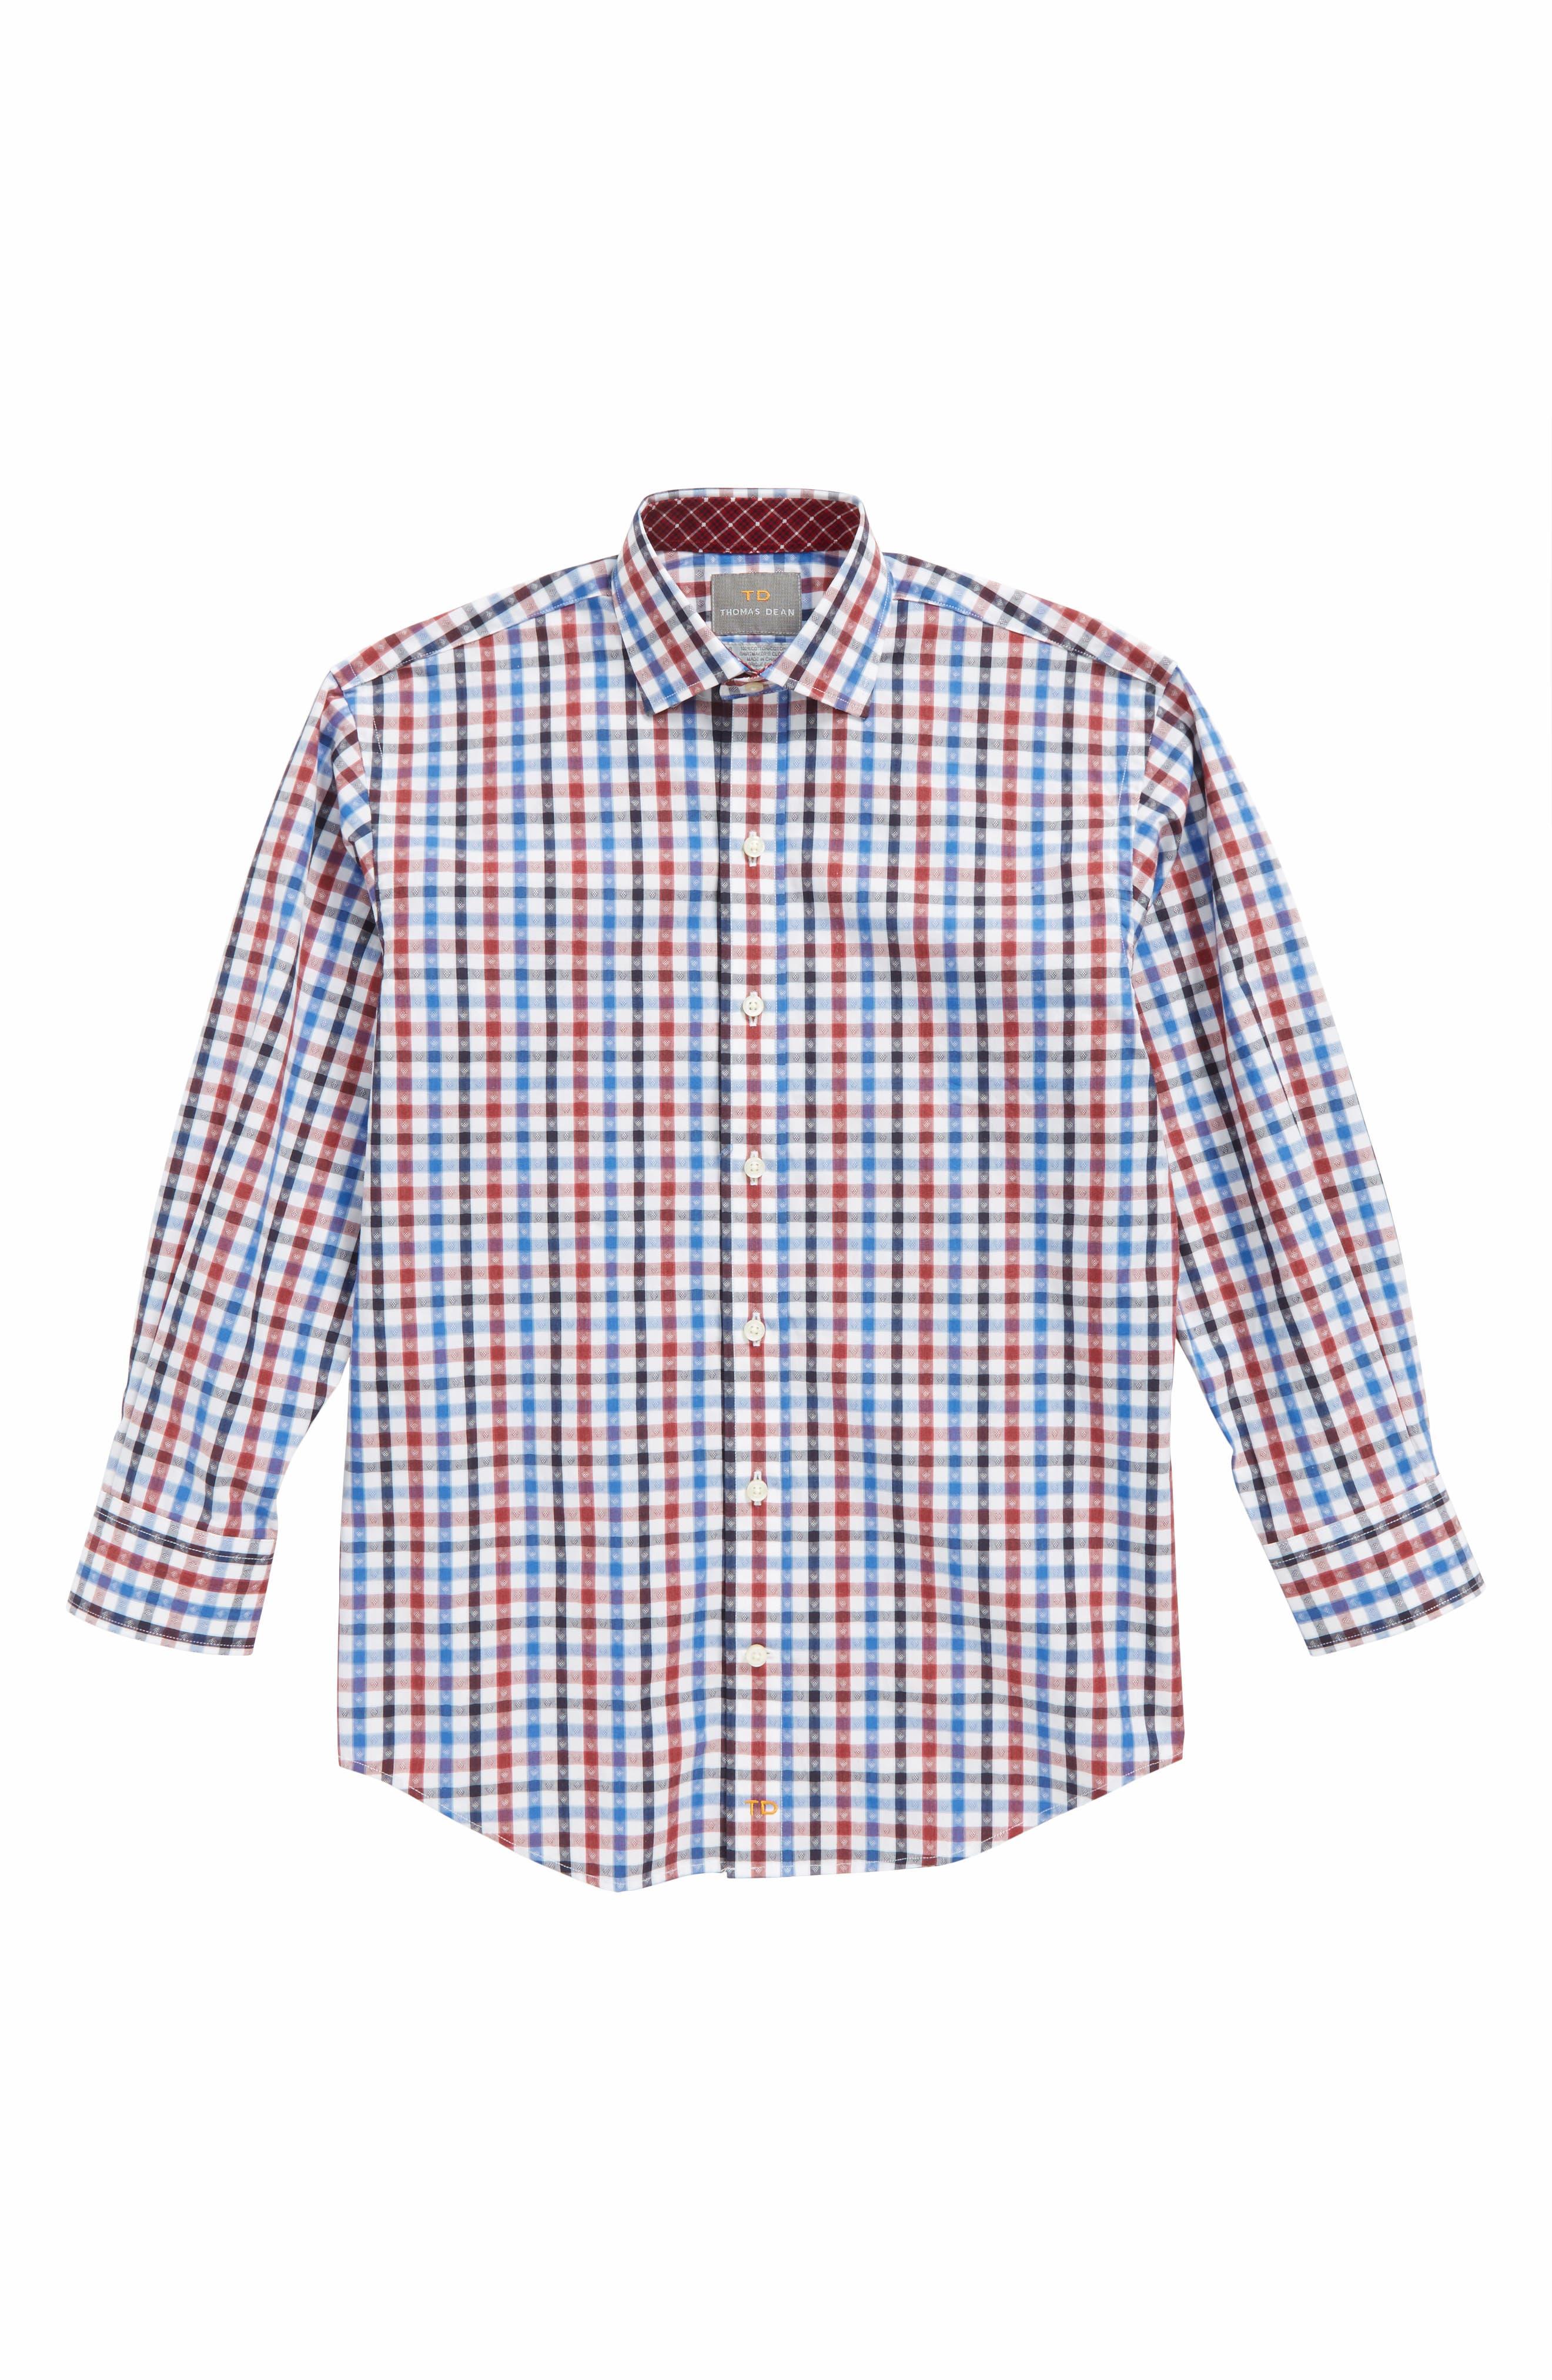 Main Image - Thomas Dean Shadow Check Dress Shirt (Big Boys)